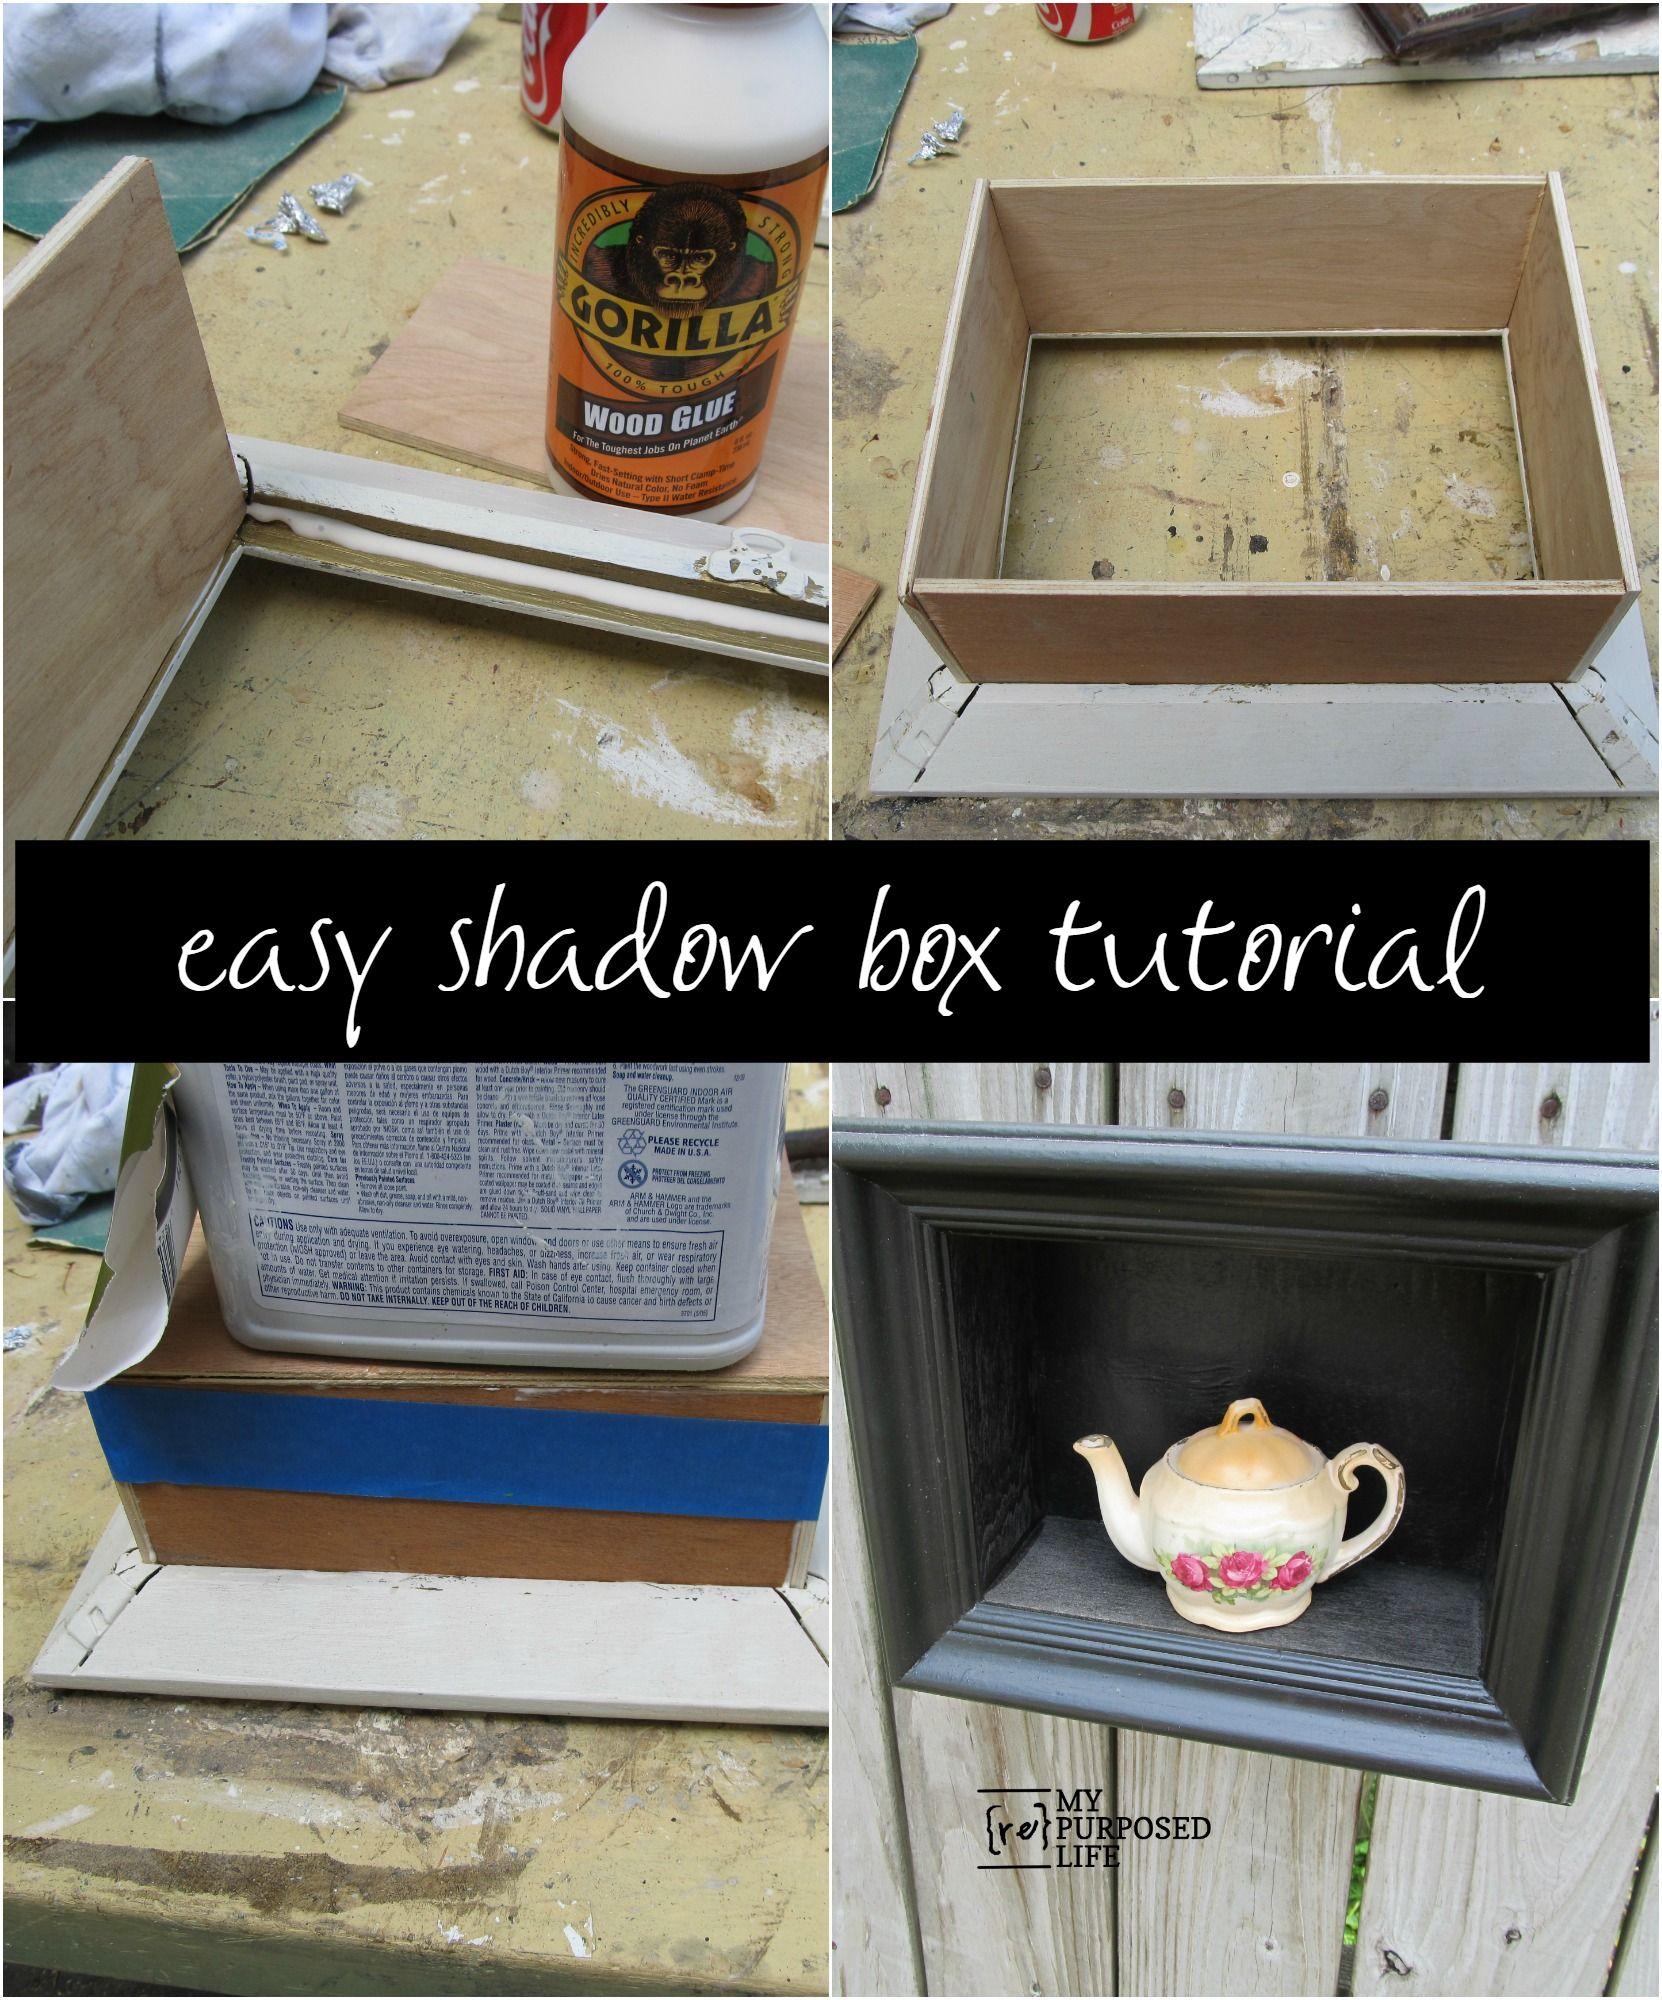 diy shadow box frame projects diy shadow box shadow. Black Bedroom Furniture Sets. Home Design Ideas